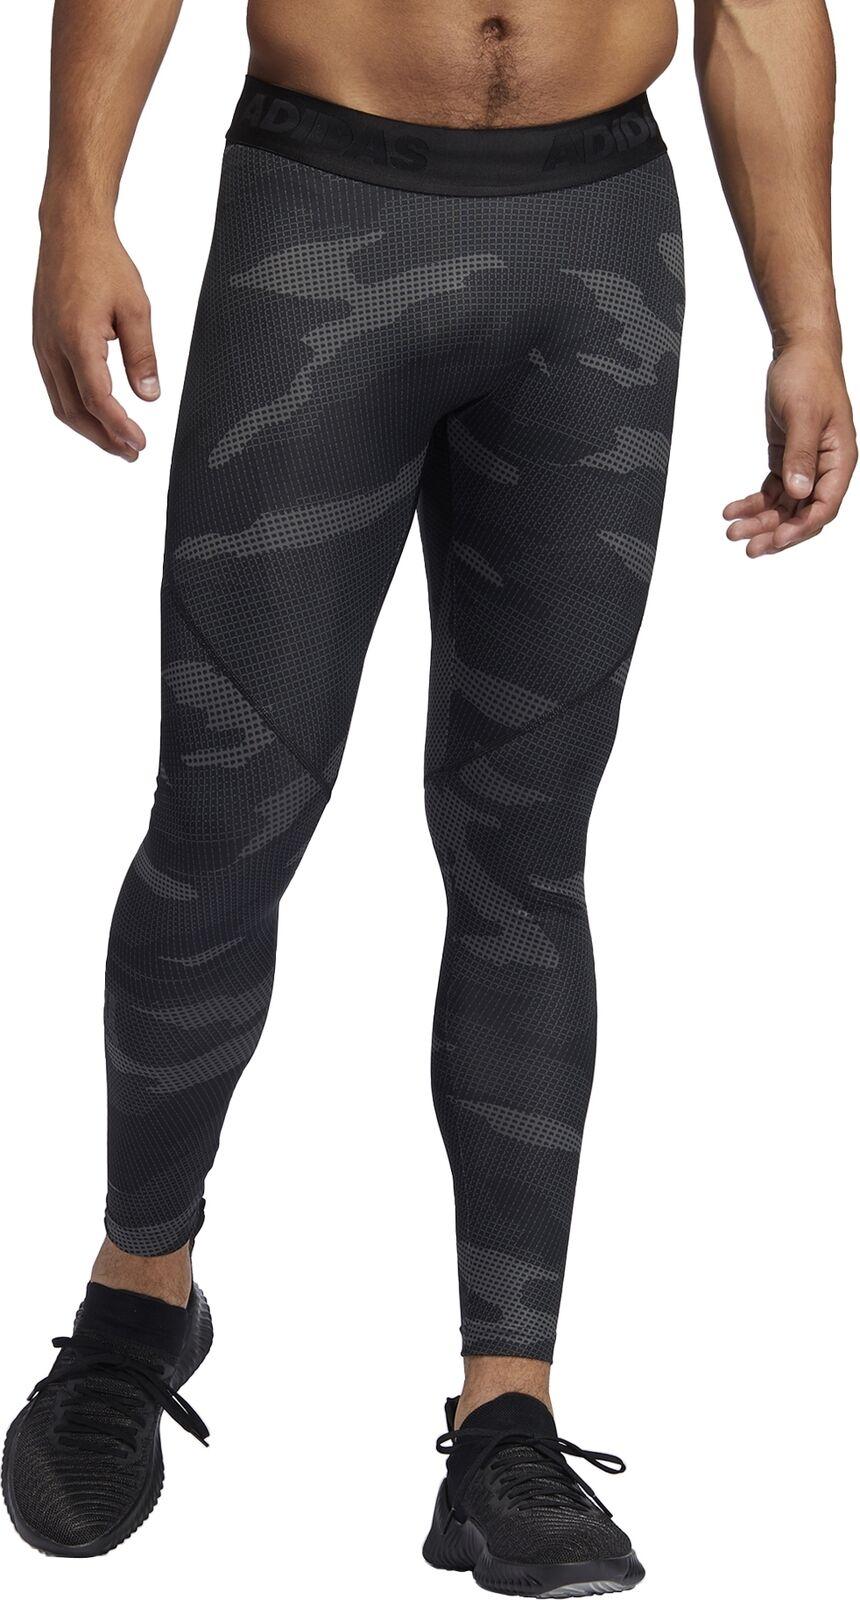 Adidas AlphaSkin Camouflage Mens Training Tights grau Gym Workout Compression